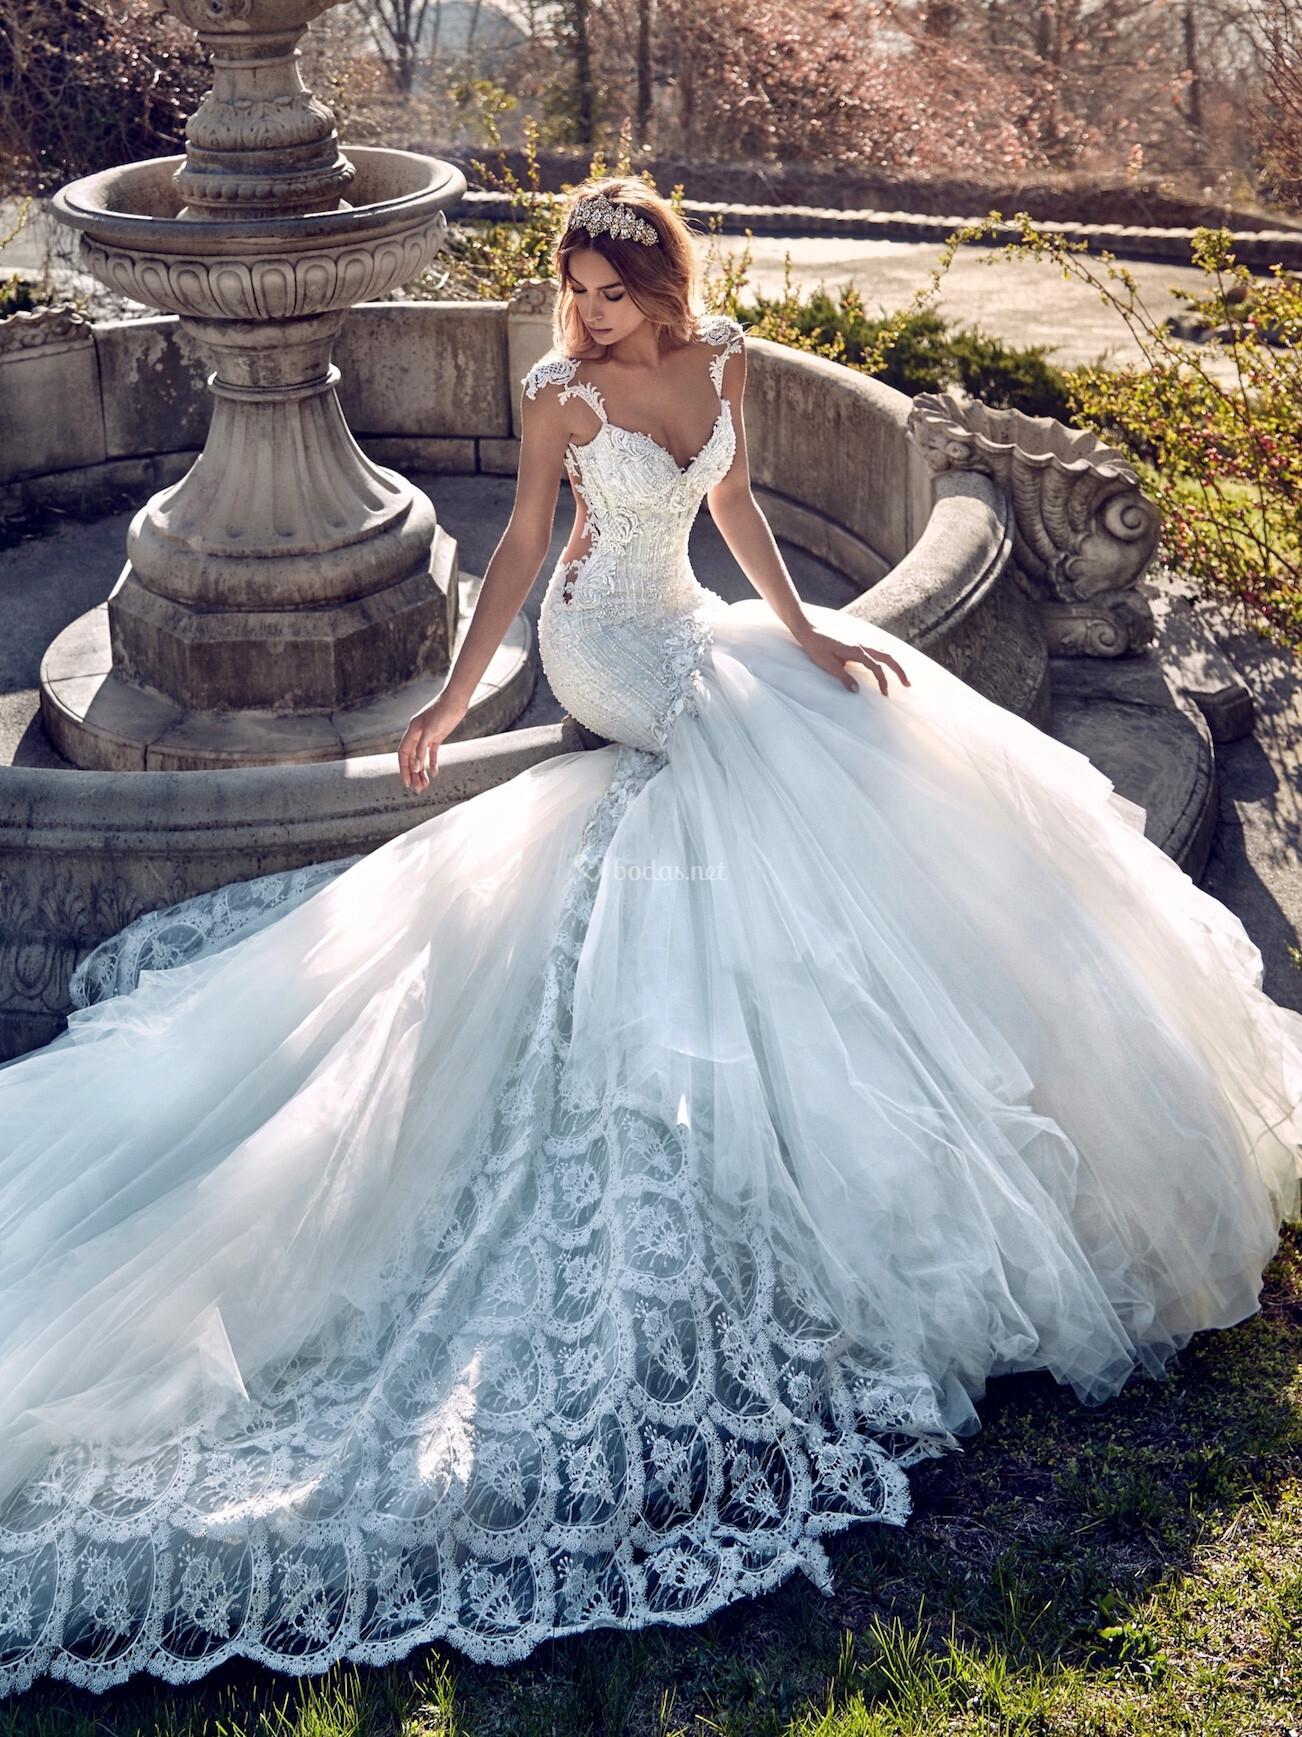 Fancy Vestido Novia Kate Middleton Component - All Wedding Dresses ...